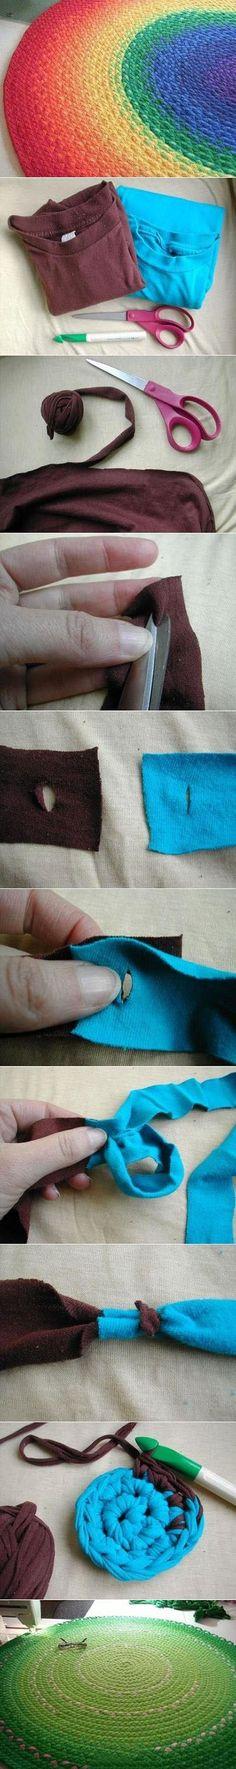 Colorful Craft   DIY & Crafts Tutorials